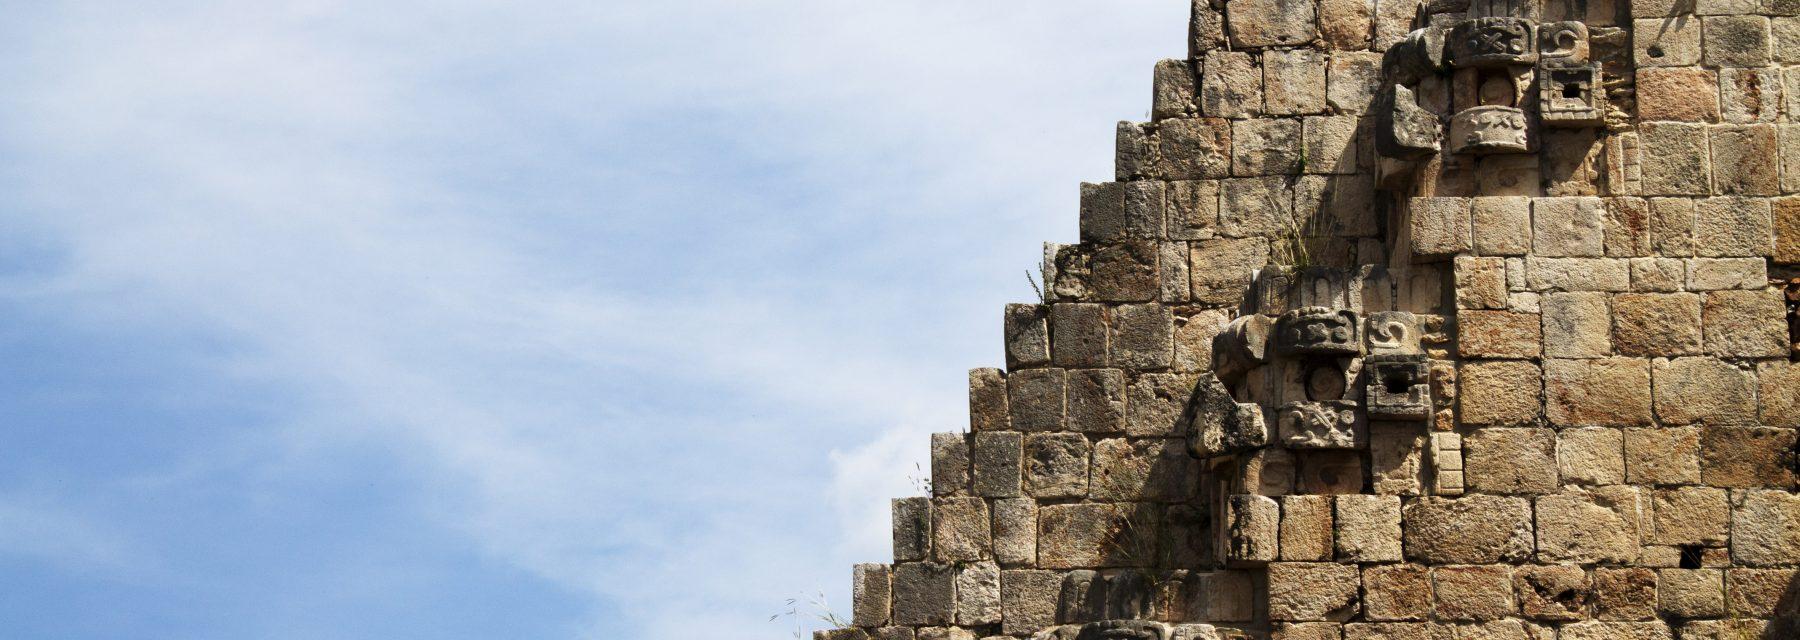 I Congreso Internacional de Arquitectura e Iconografía Precolombina